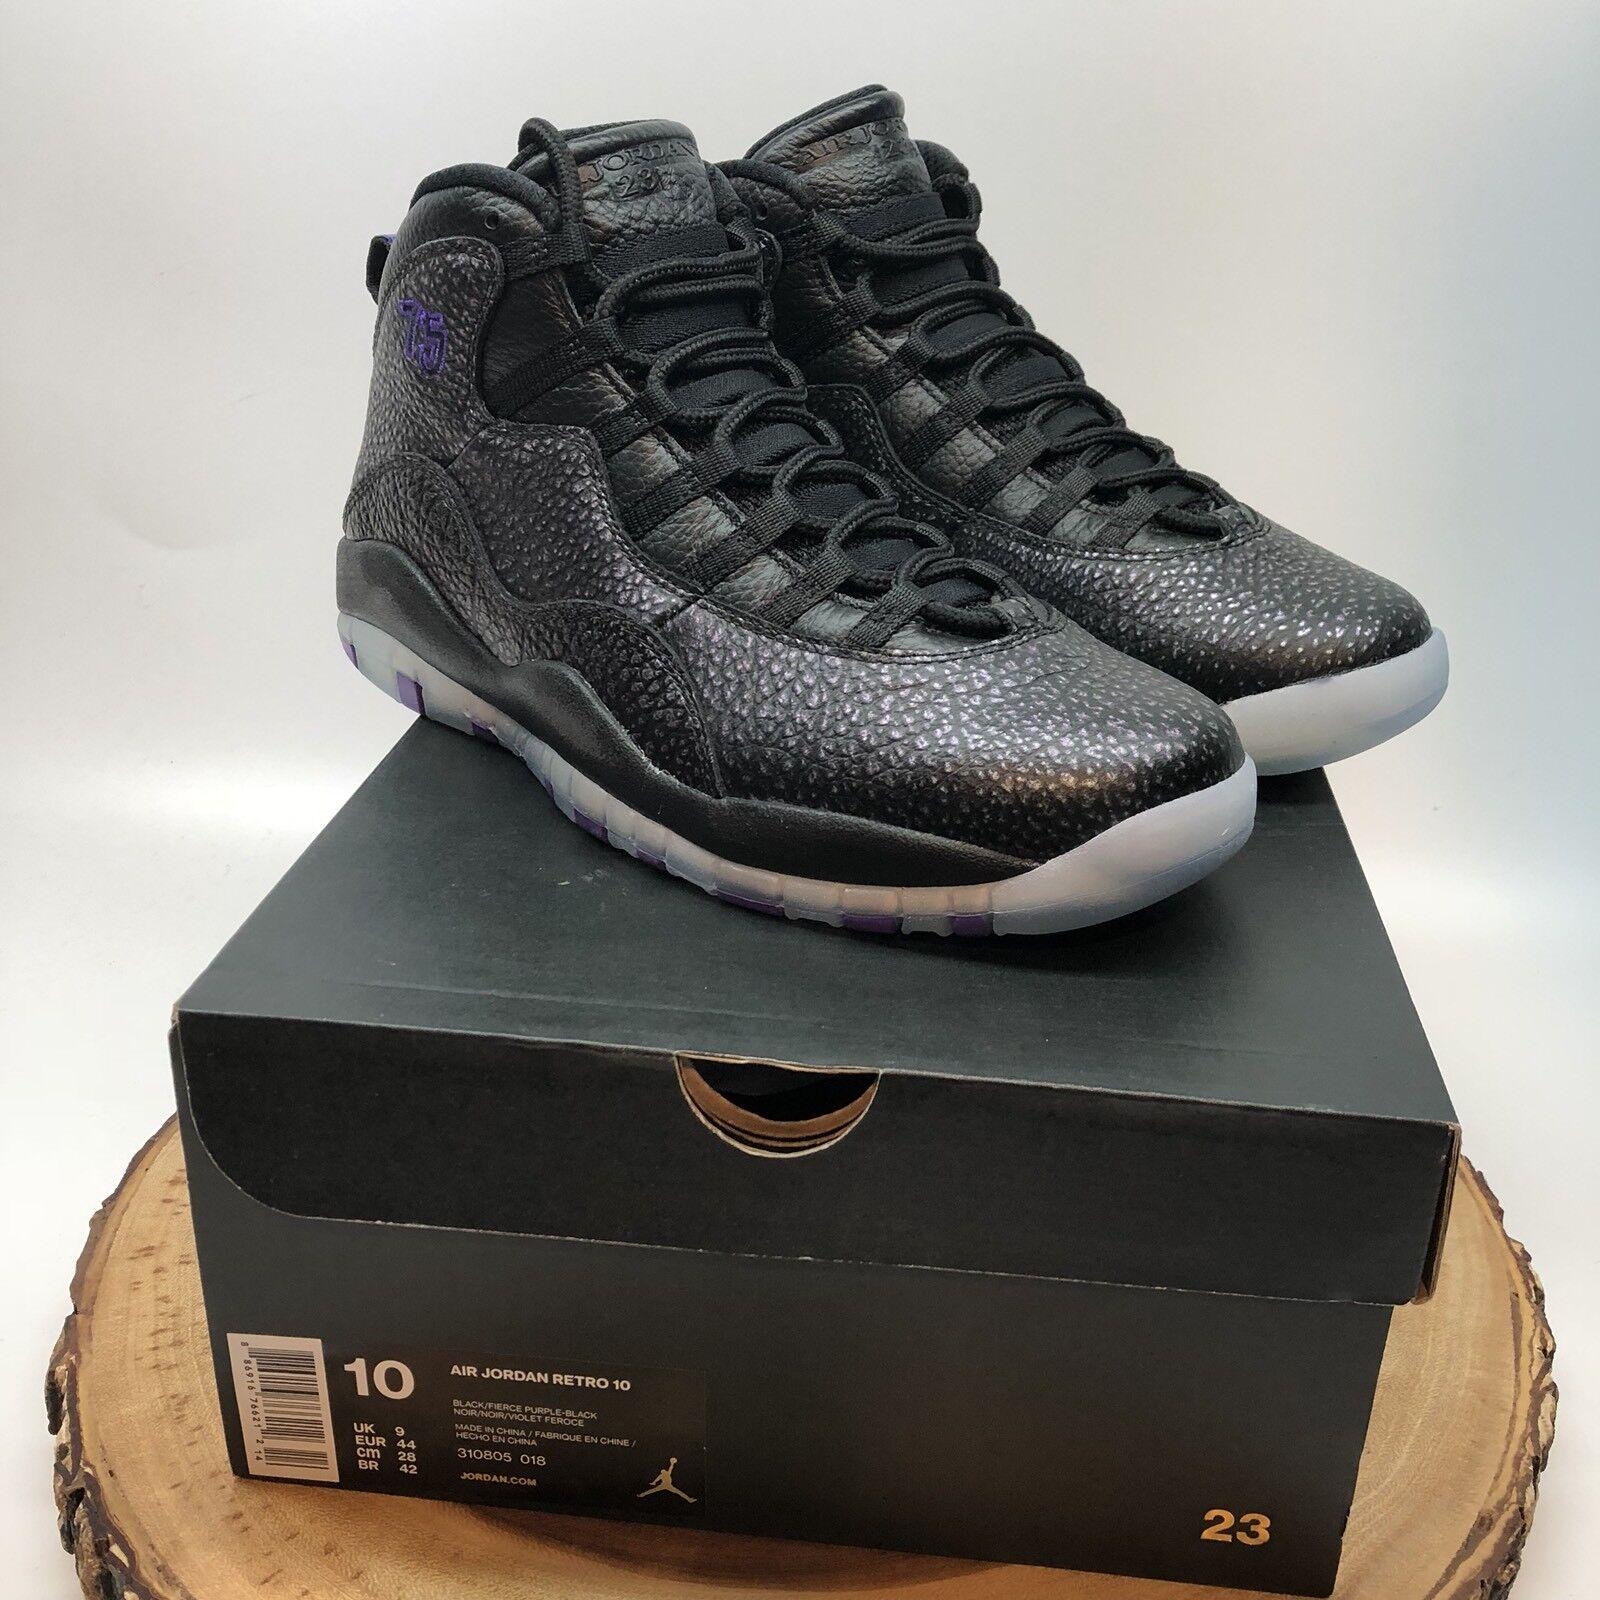 Nike Nike Nike air jordan retro - x stadt paris pack euro exklusive 310805 018 größe 10 xi - xii 6e617b